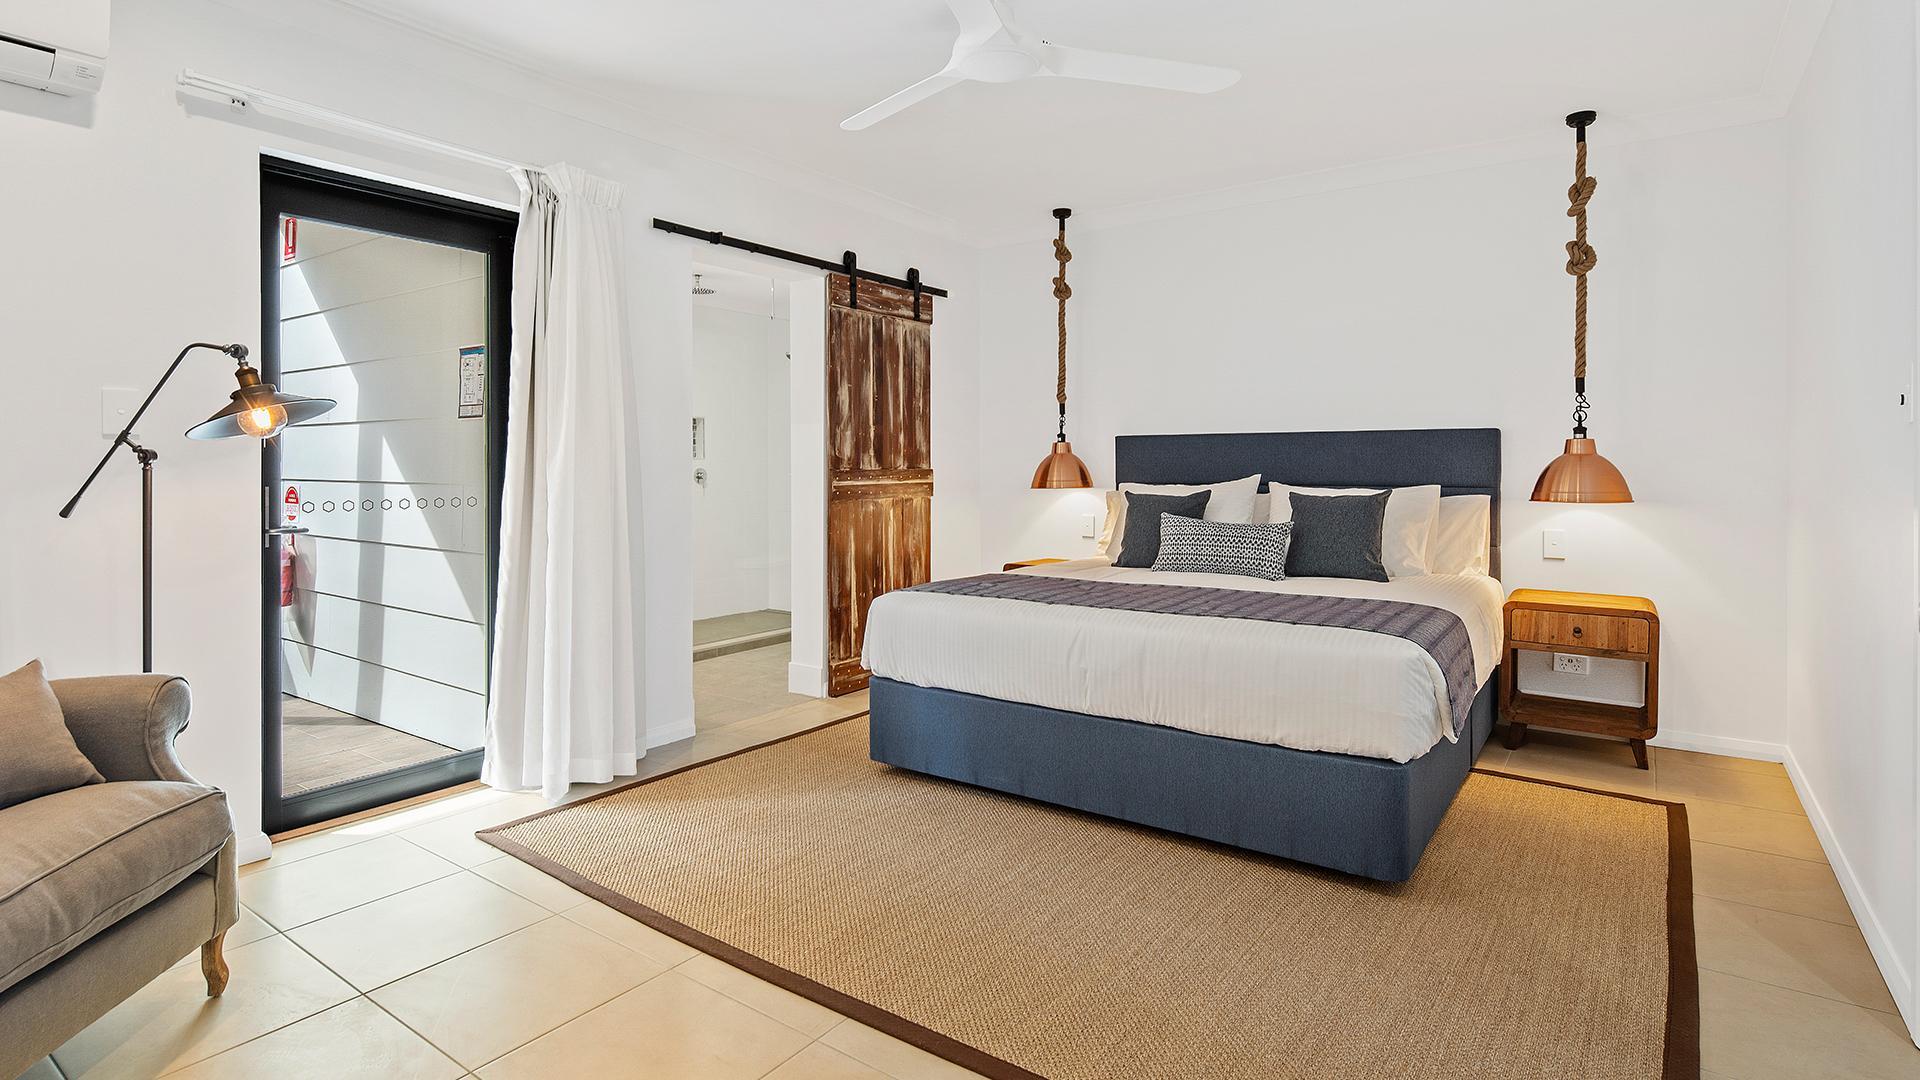 Resort Suite NOV 2020 image 1 at Freedom Shores by Whitsunday Regional, Queensland, Australia